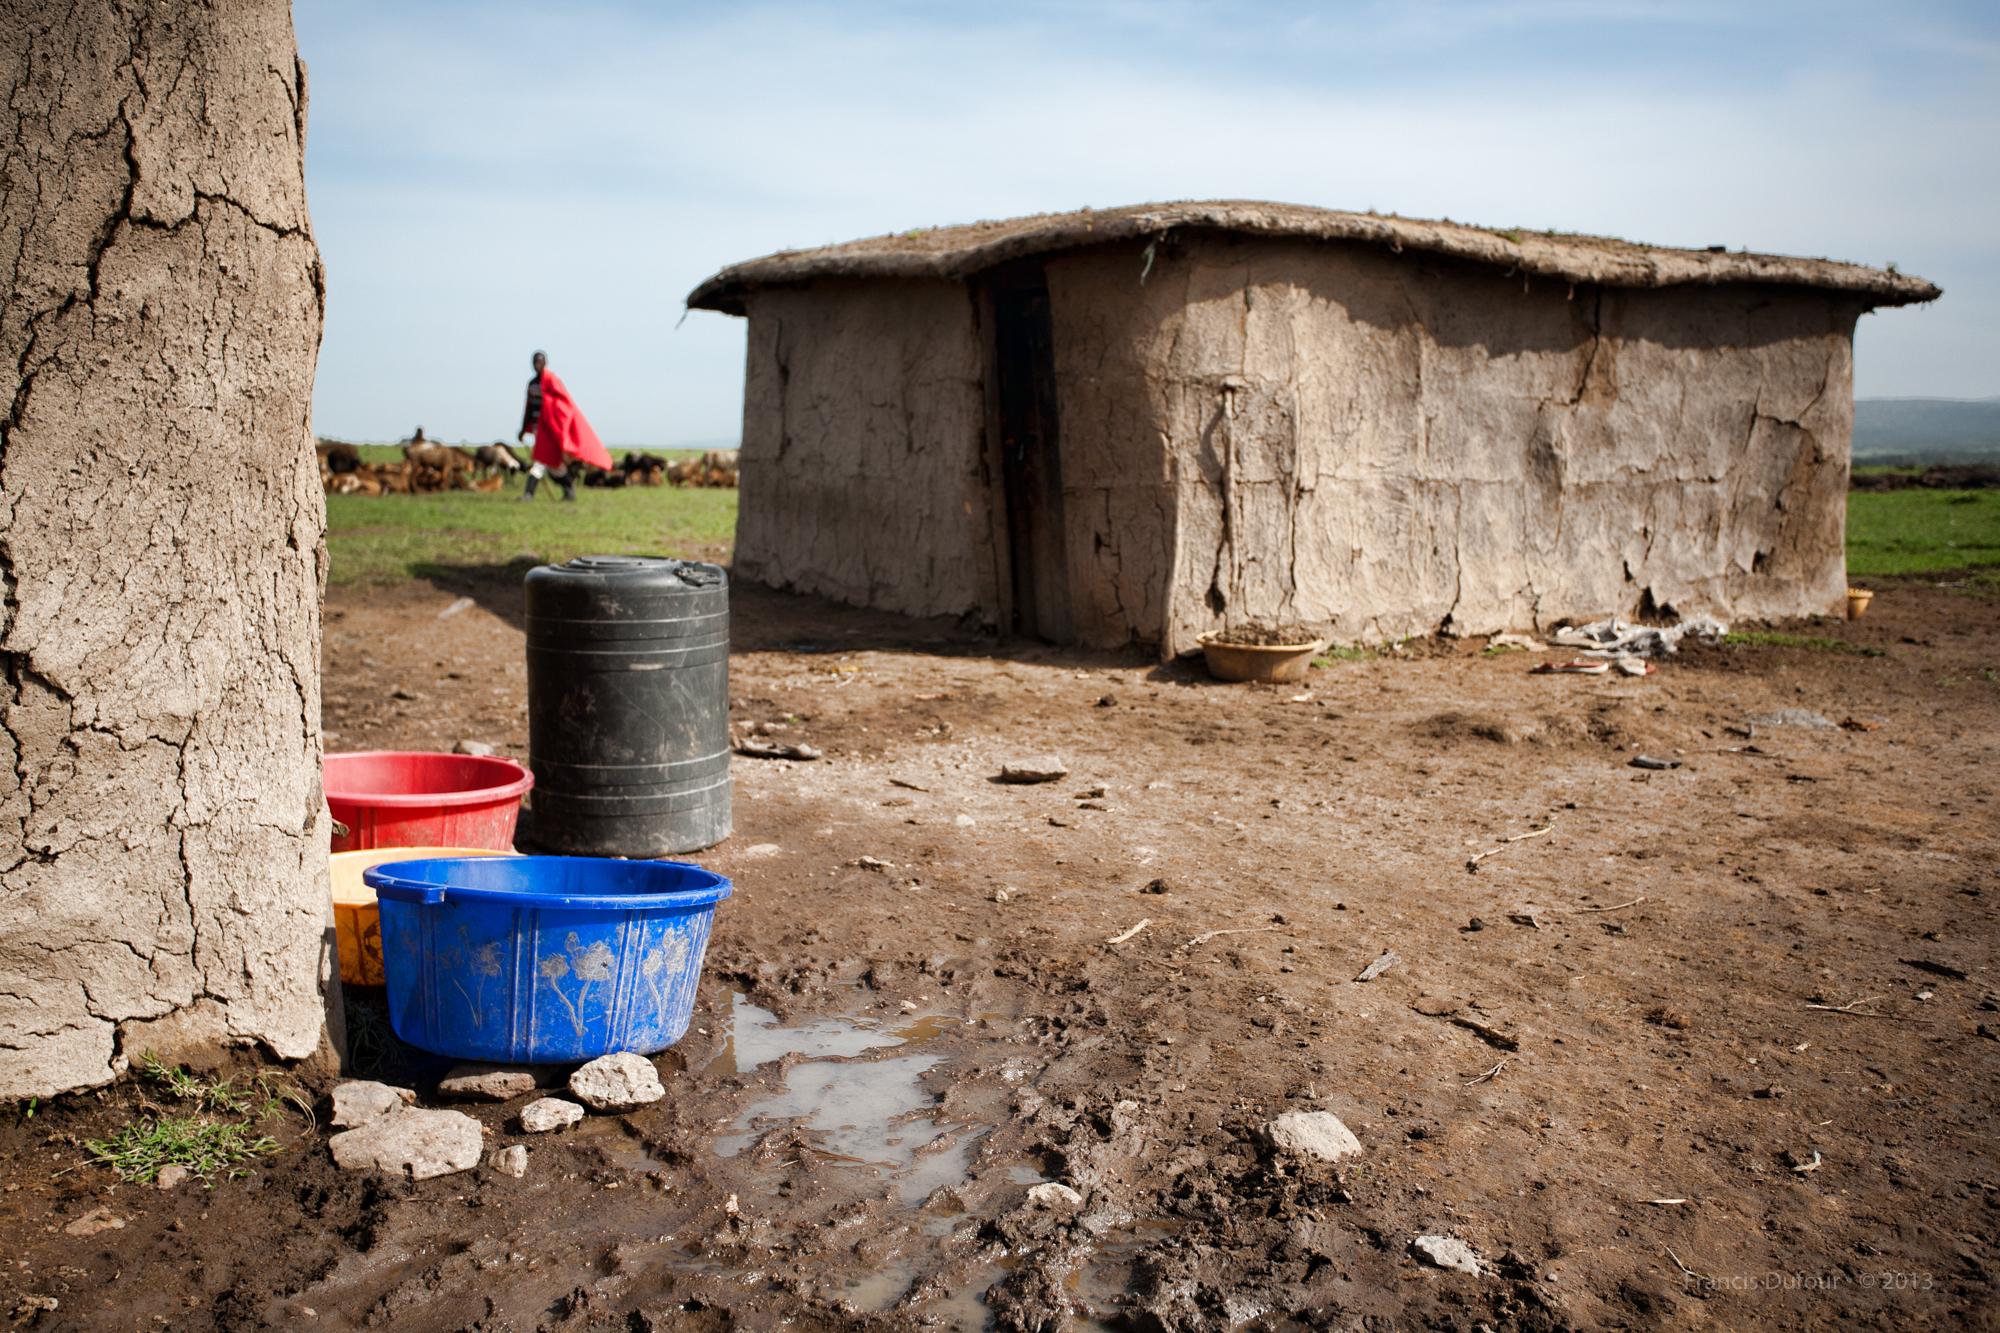 FD-IMG-1266-africa-kenya-masai-mara-village-house